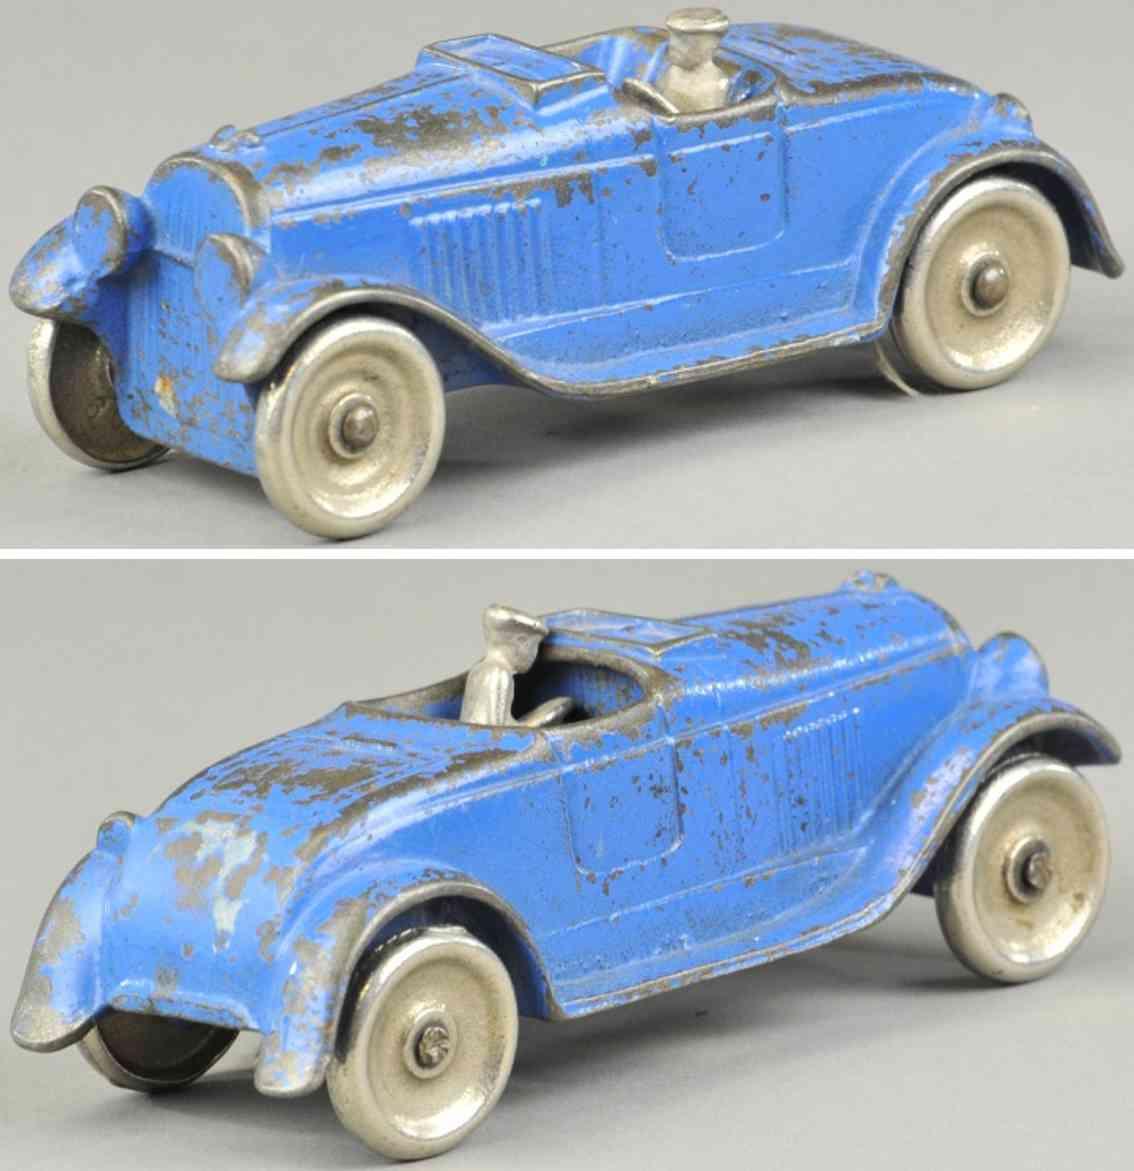 kilgore spielzeug gusseisen auto offener roadster blau